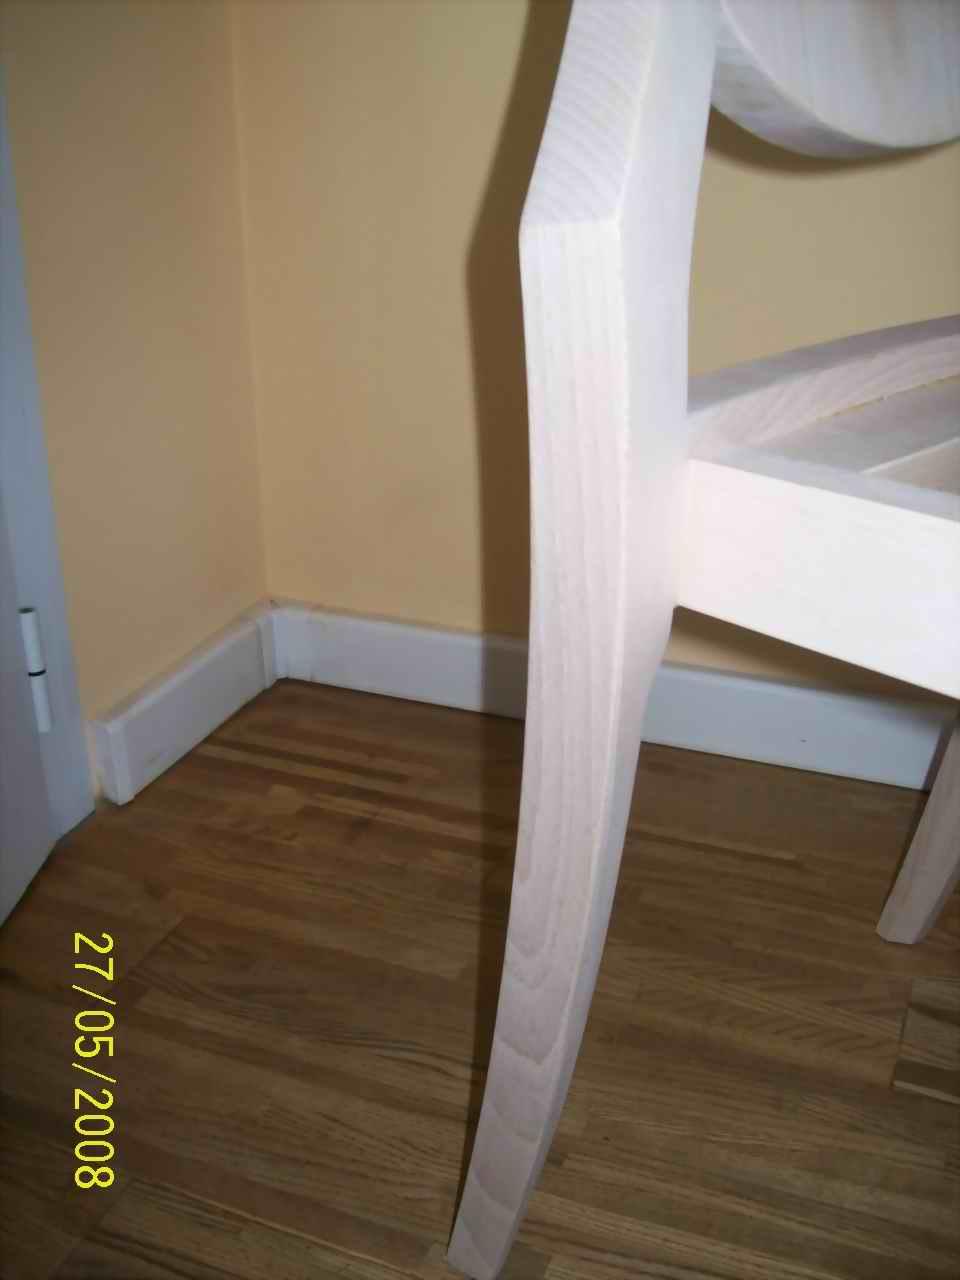 Beech wood furniture elements